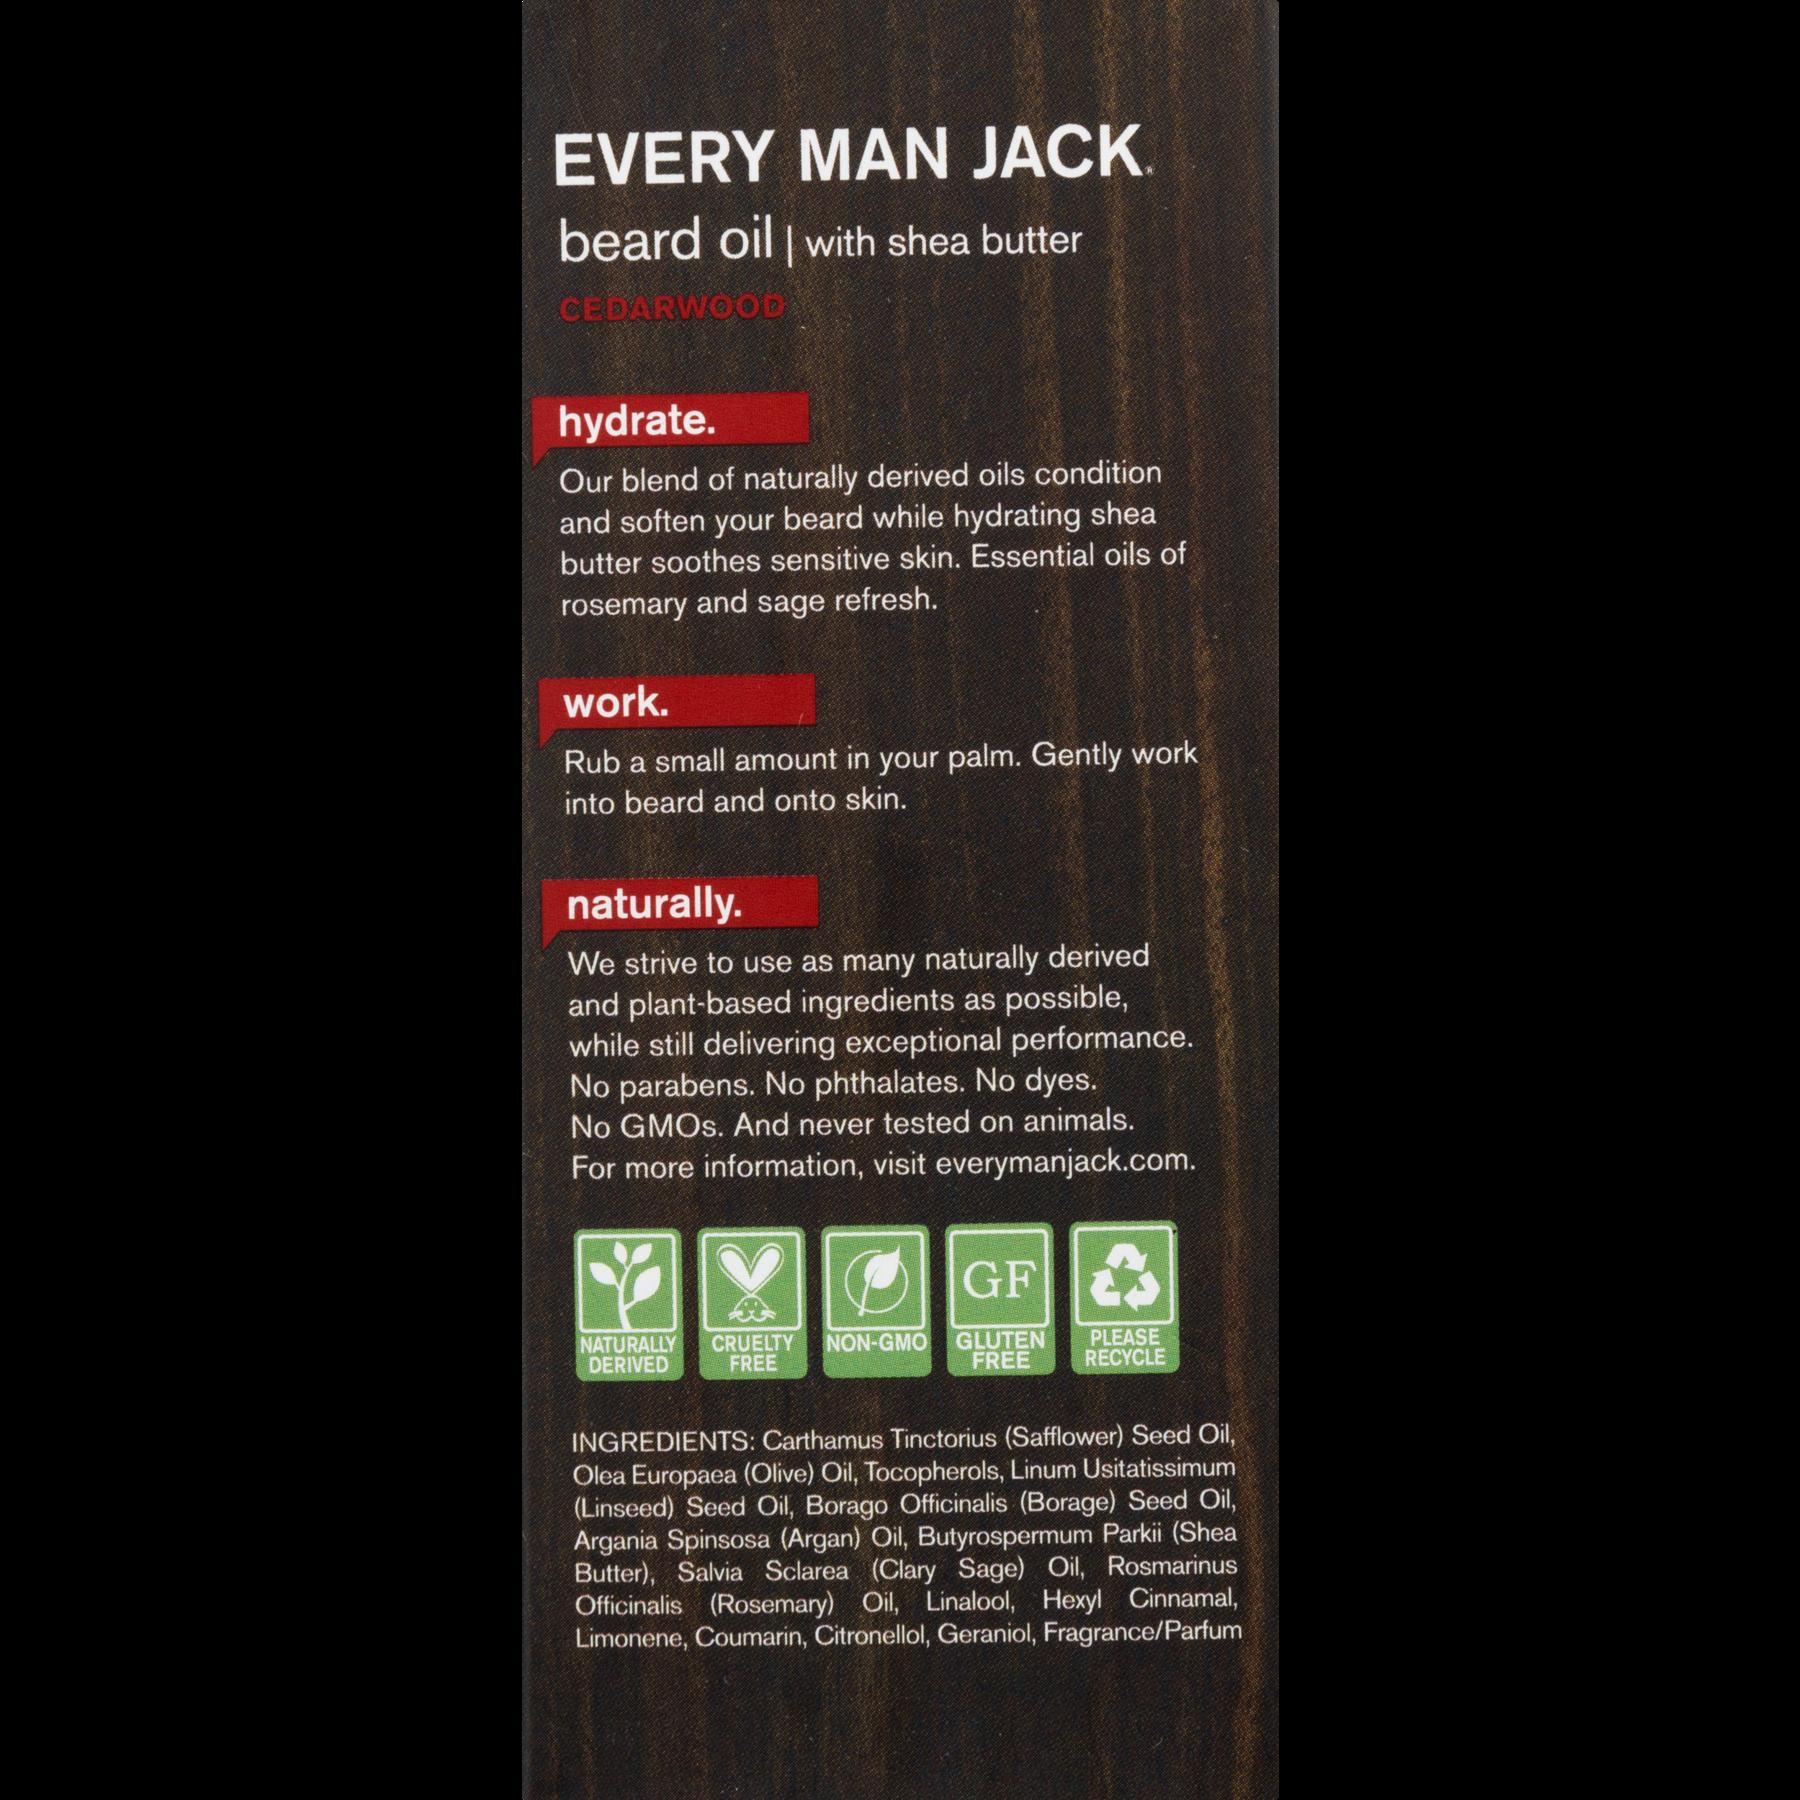 Every Man Jack Beard Oil, Cedarwood, 1 Oz - Walmart com